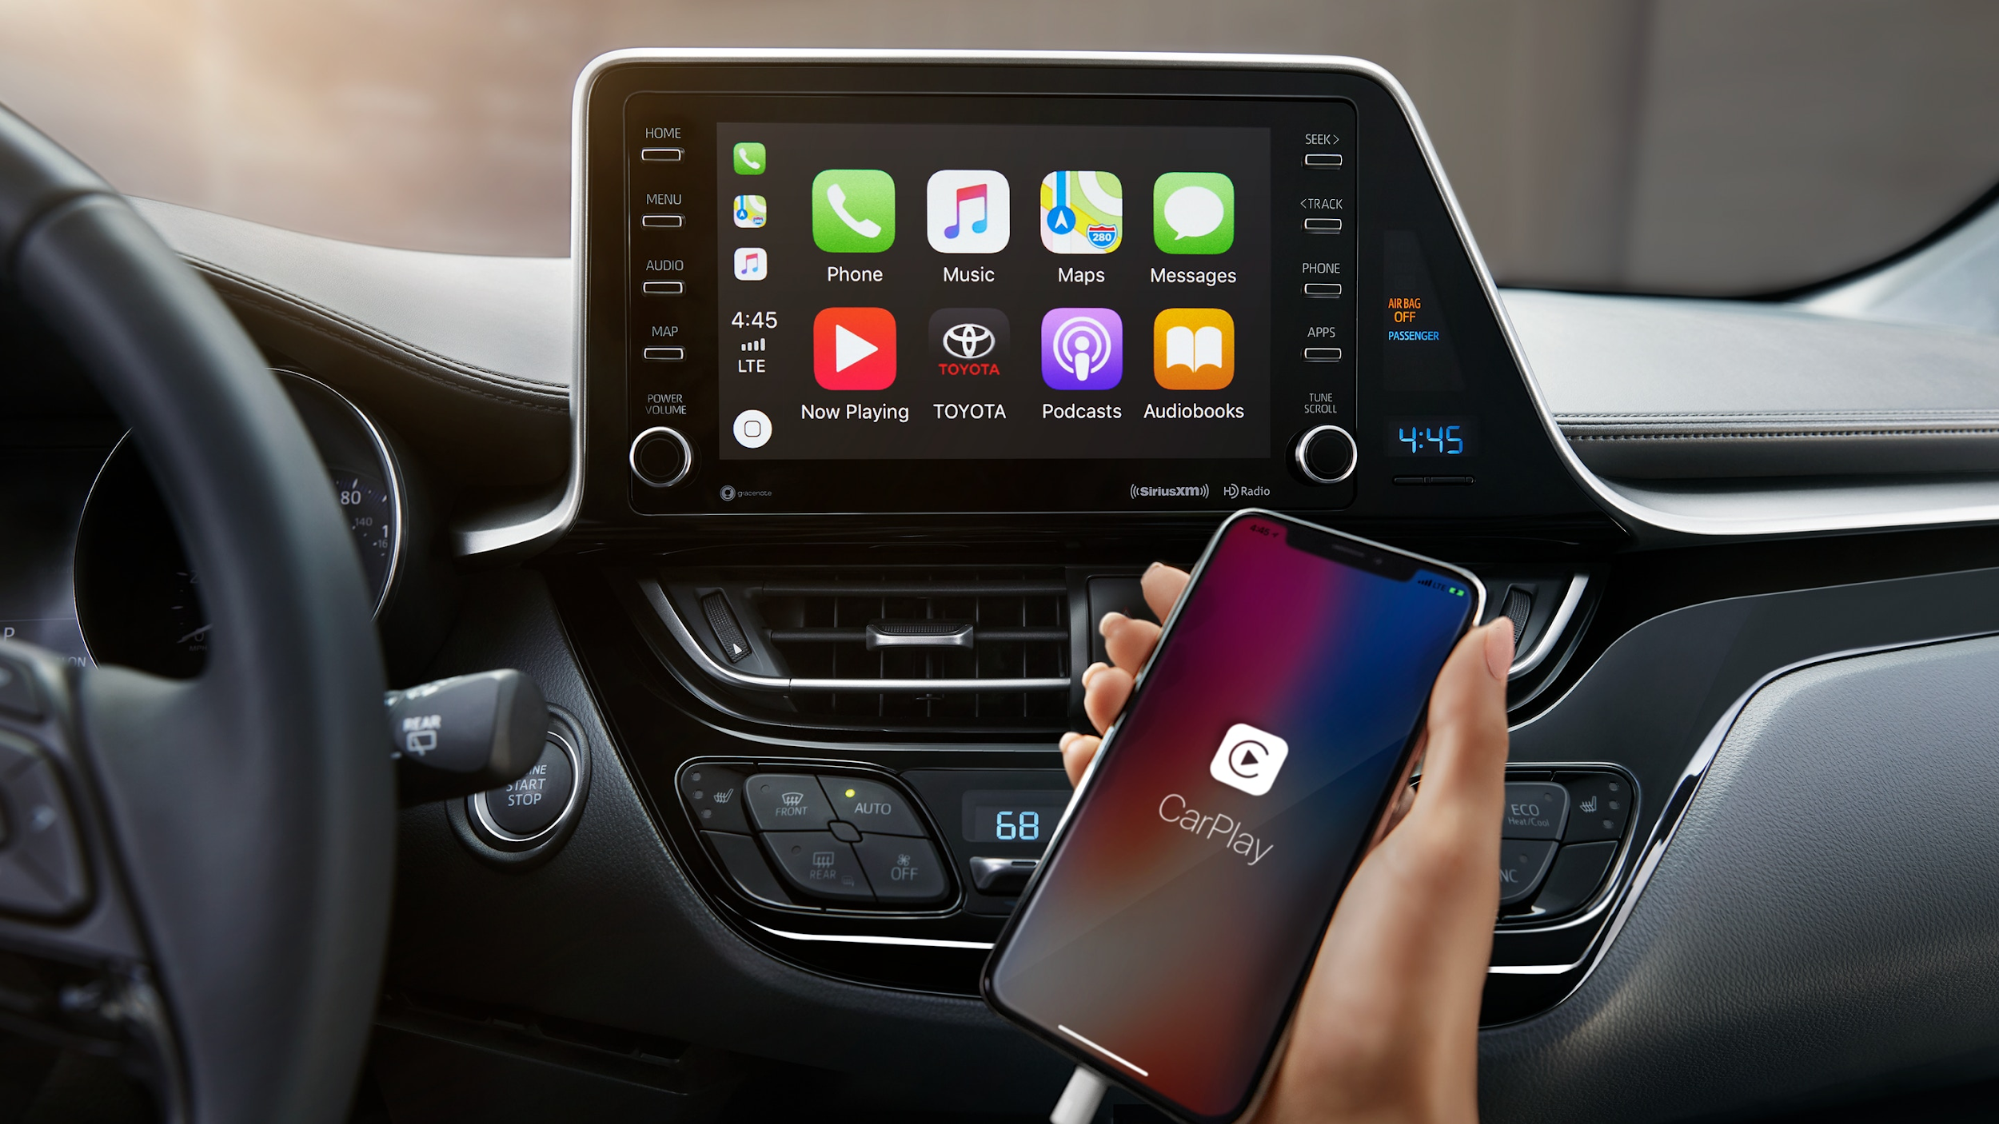 2019 Toyota C-HR Apple CarPlay Smartphone Integration